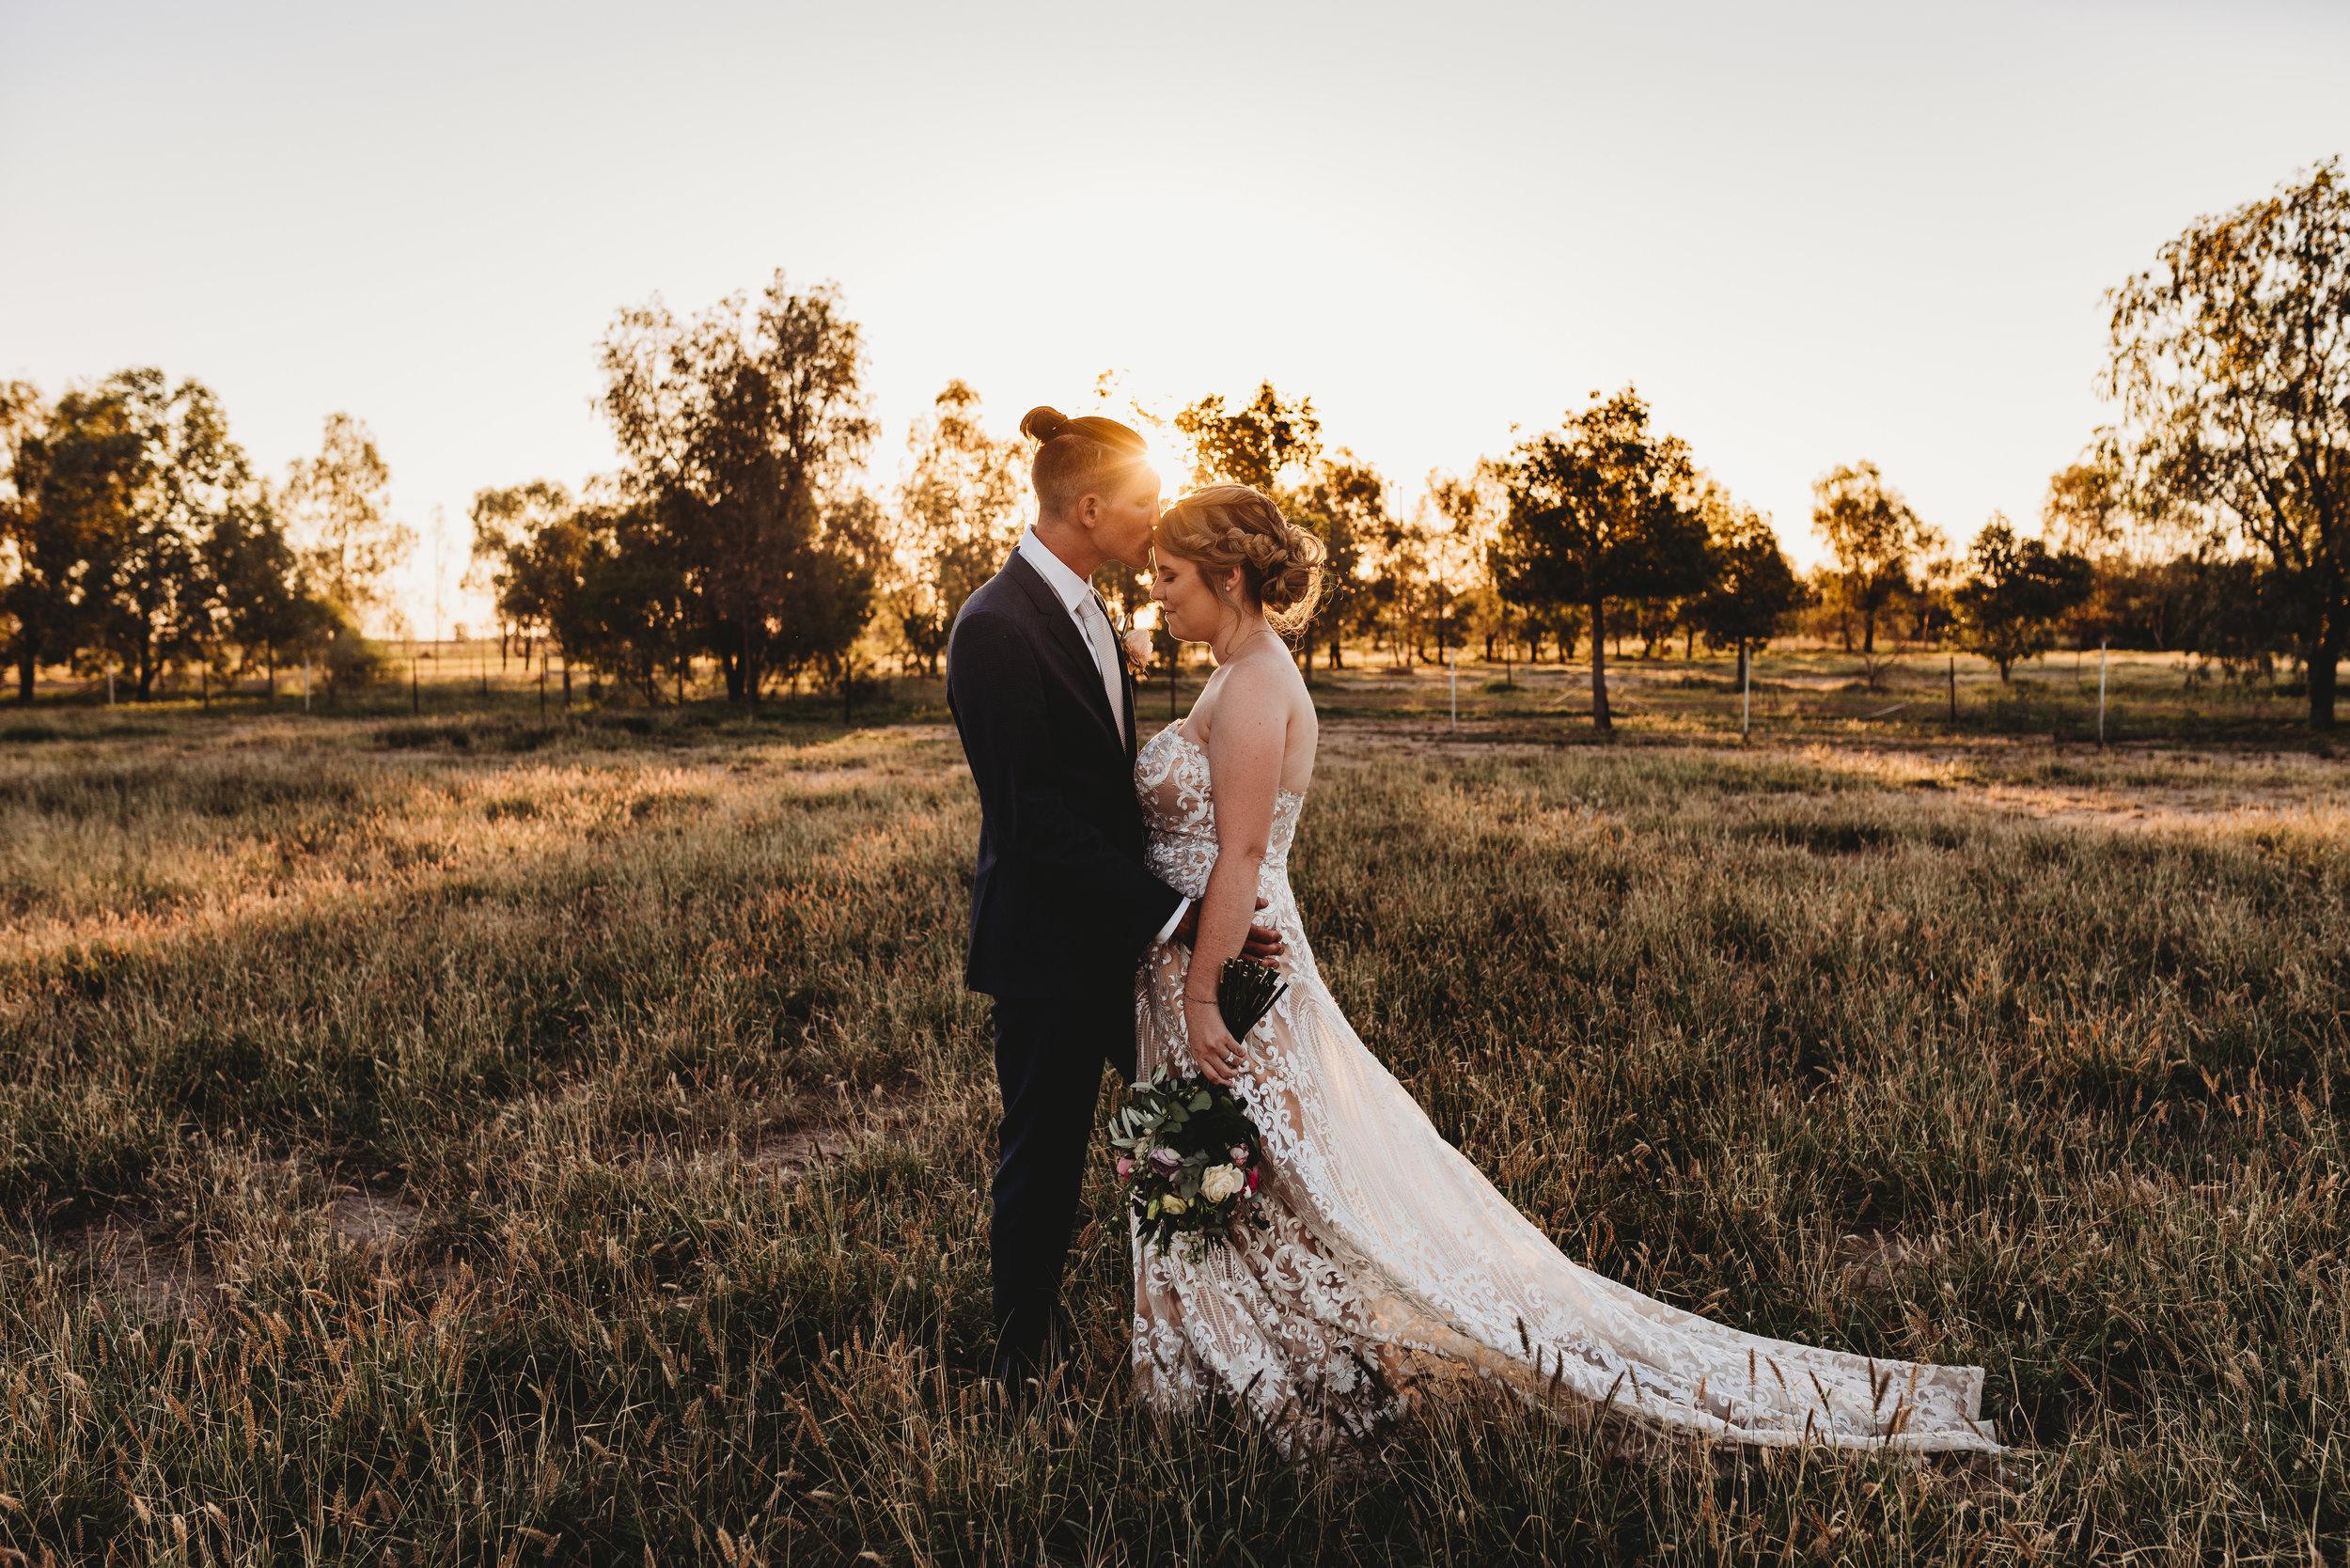 Sharni & Malcolm - Goondiwindi, QLD Country Wedding    1st December 2018